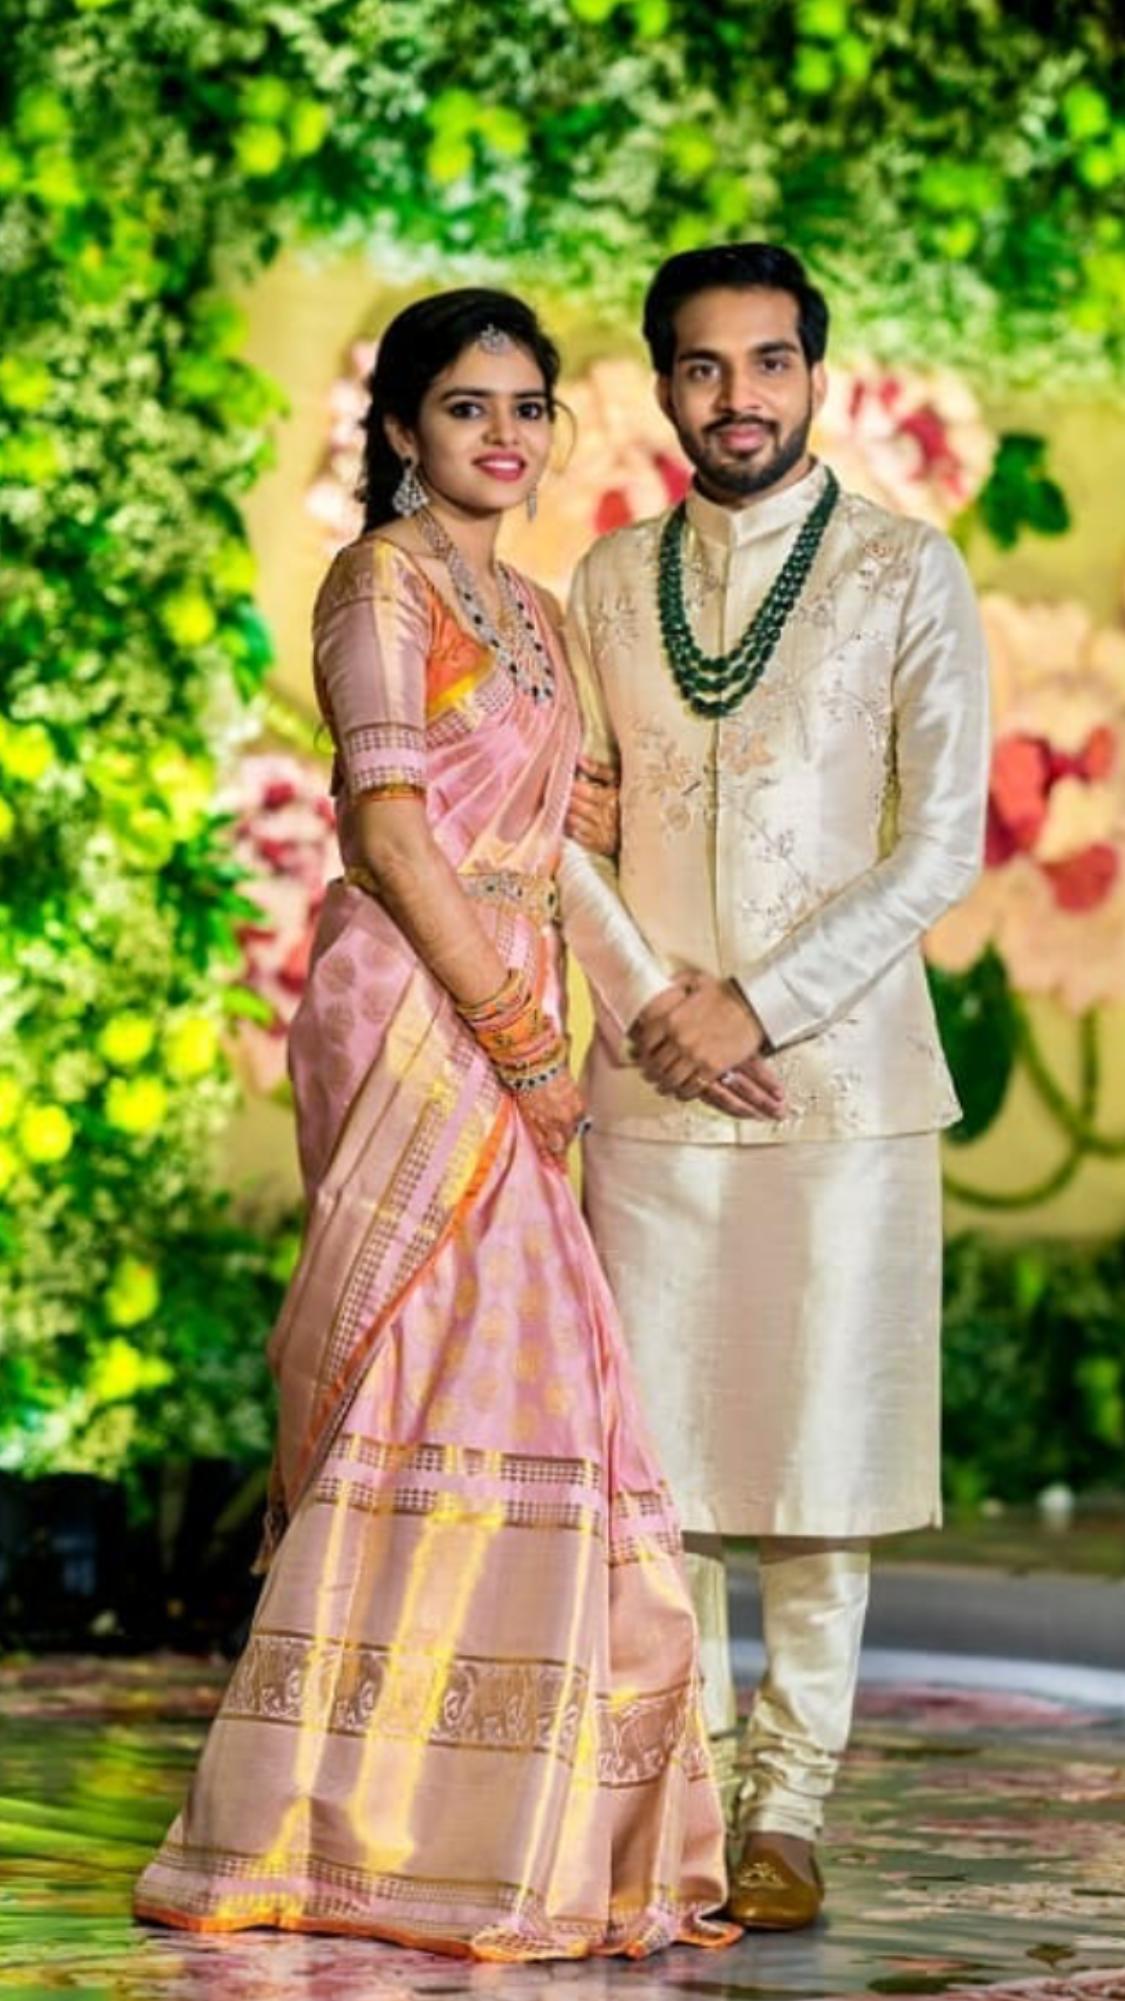 Pin By Priyanka Sharma On Latest Saree Designs Bridal Sarees South Indian Couple Wedding Dress Indian Groom Dress [ 2001 x 1125 Pixel ]